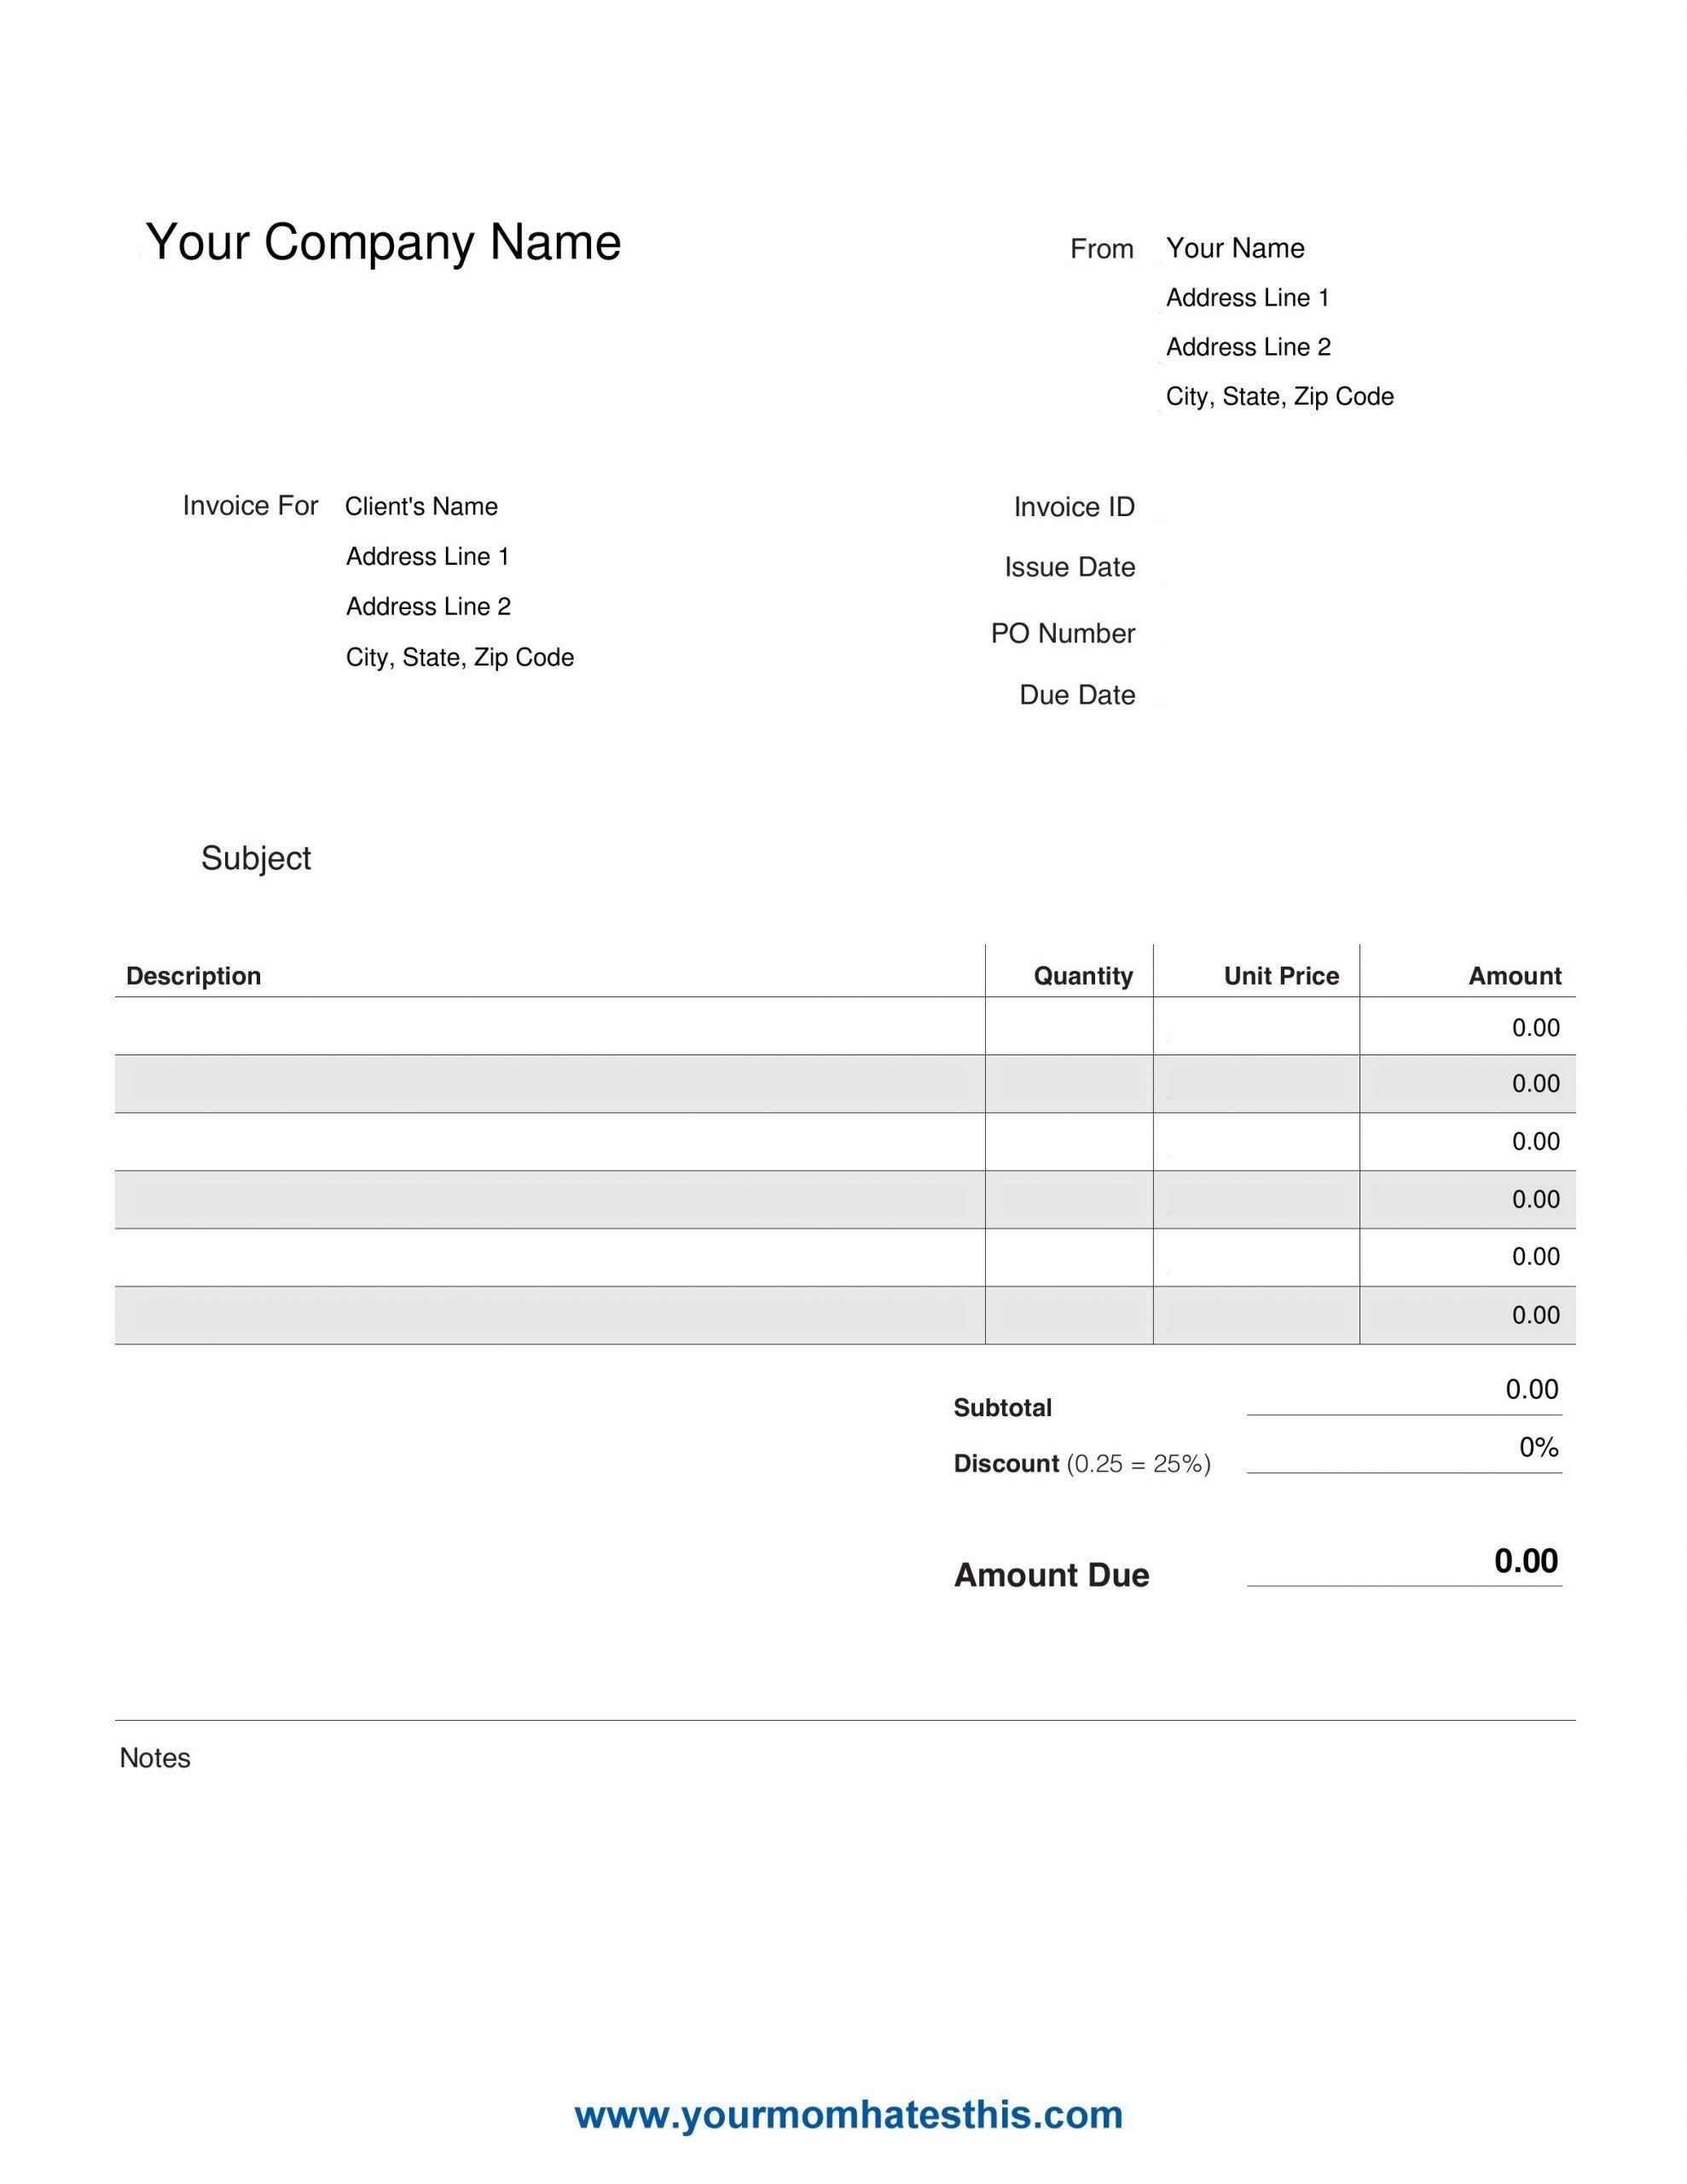 Invoice Template Au 1 Quick Tips Regarding Invoice Template Au Invoice Template Invoice Templates Invoice Template Word